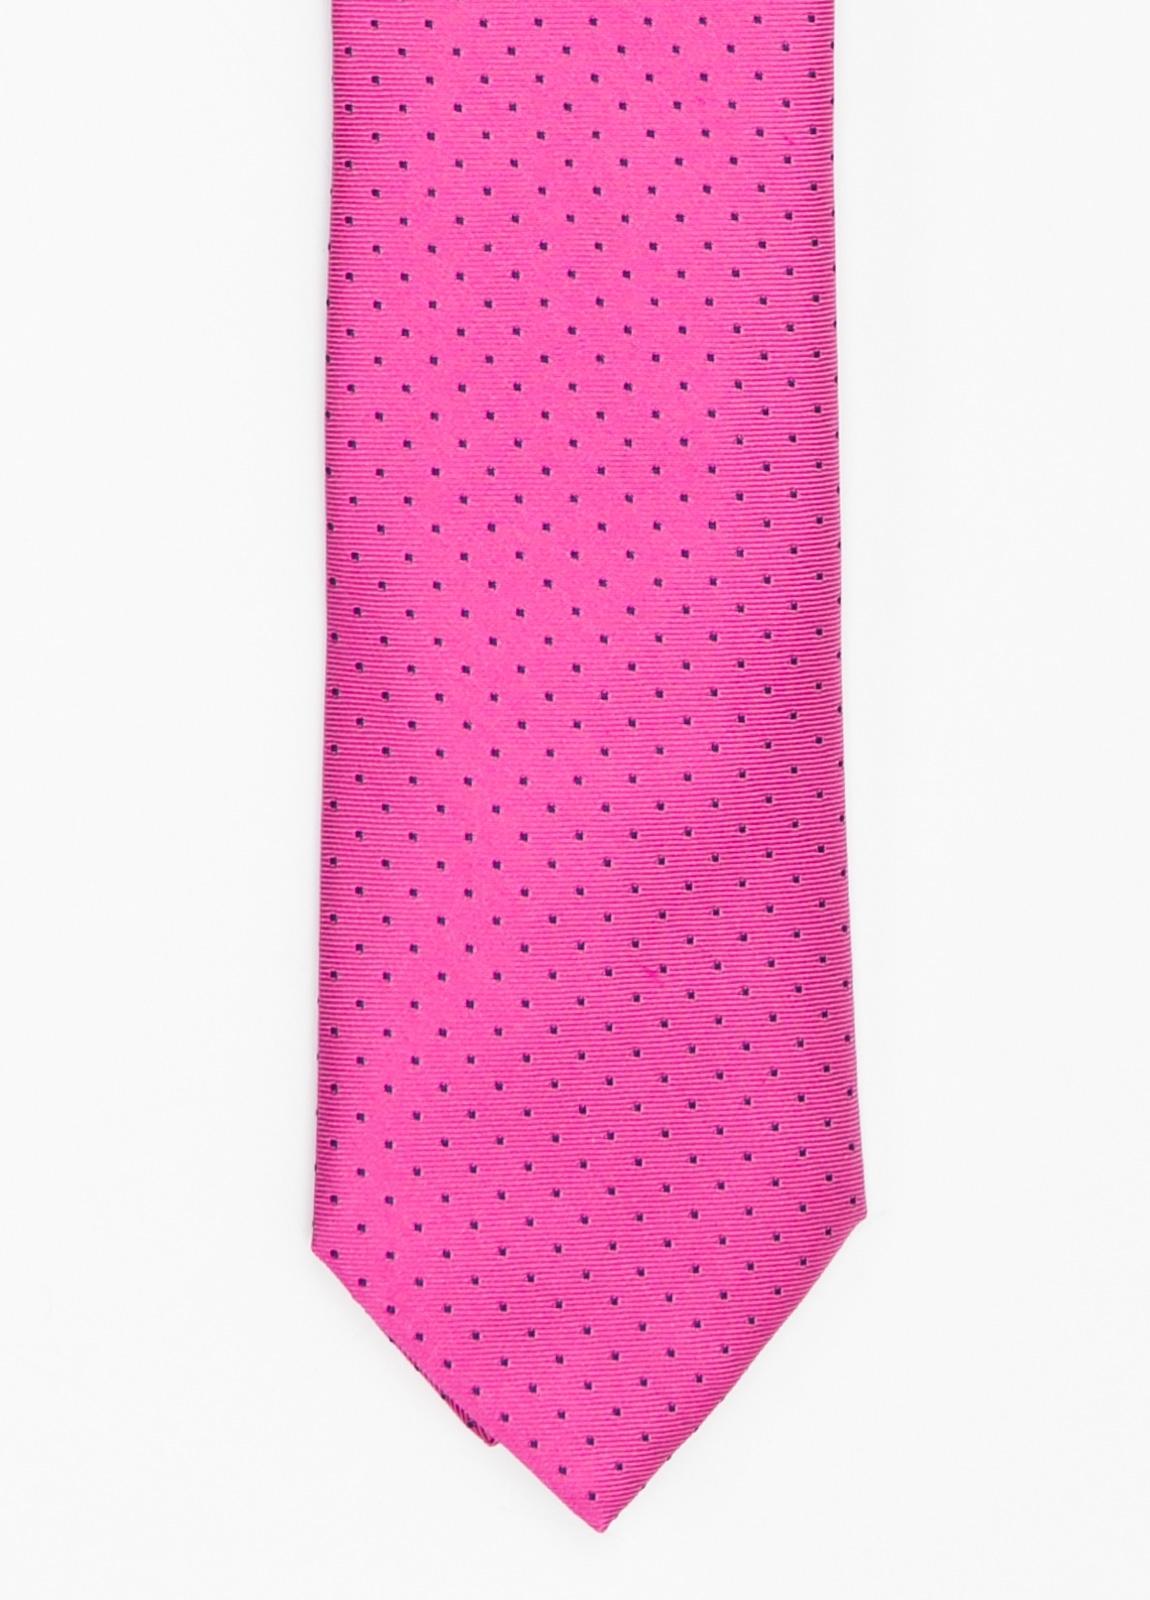 Corbata Formal Wear micro dibujo color fuxia. Pala 7,5 cm. 100% Seda.